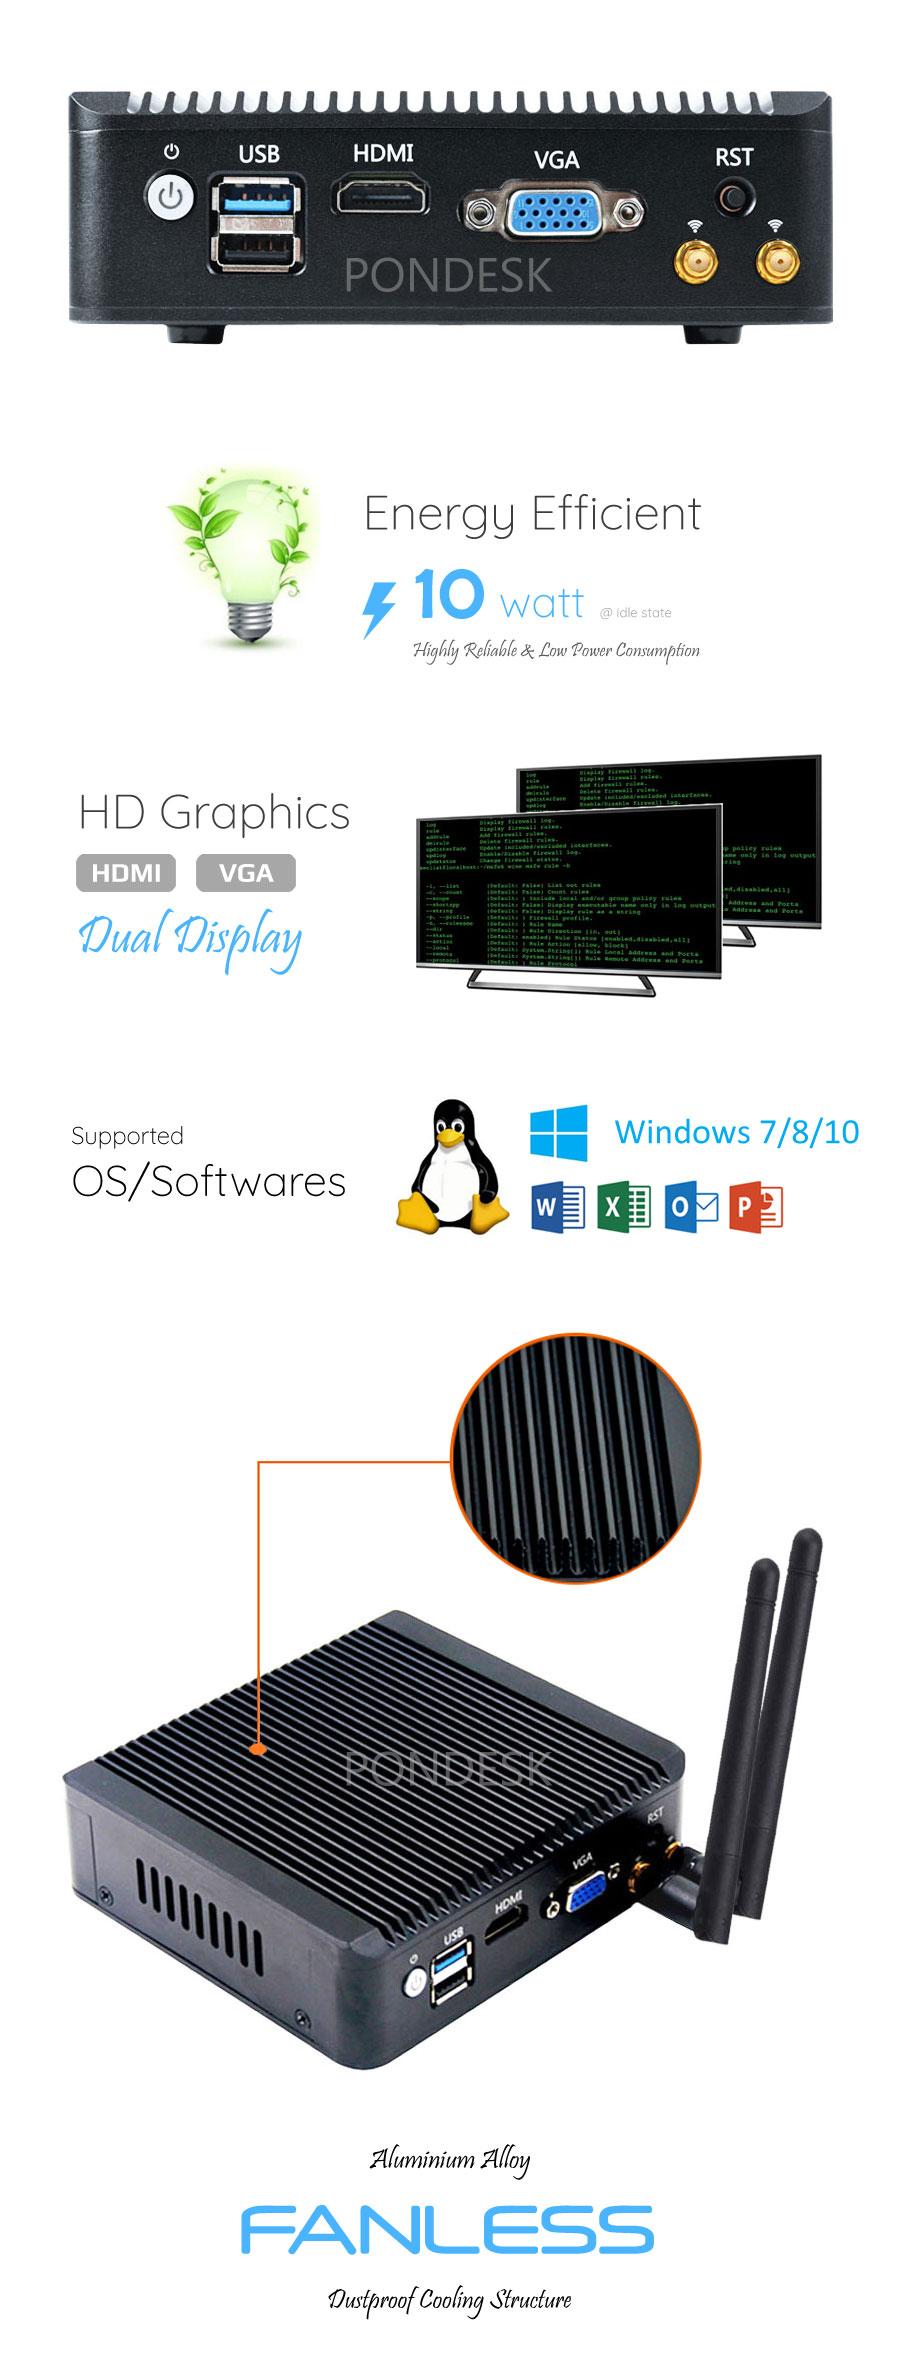 Intel J1900 4 LAN HD Dual Display 4G Fanless Firewall Router